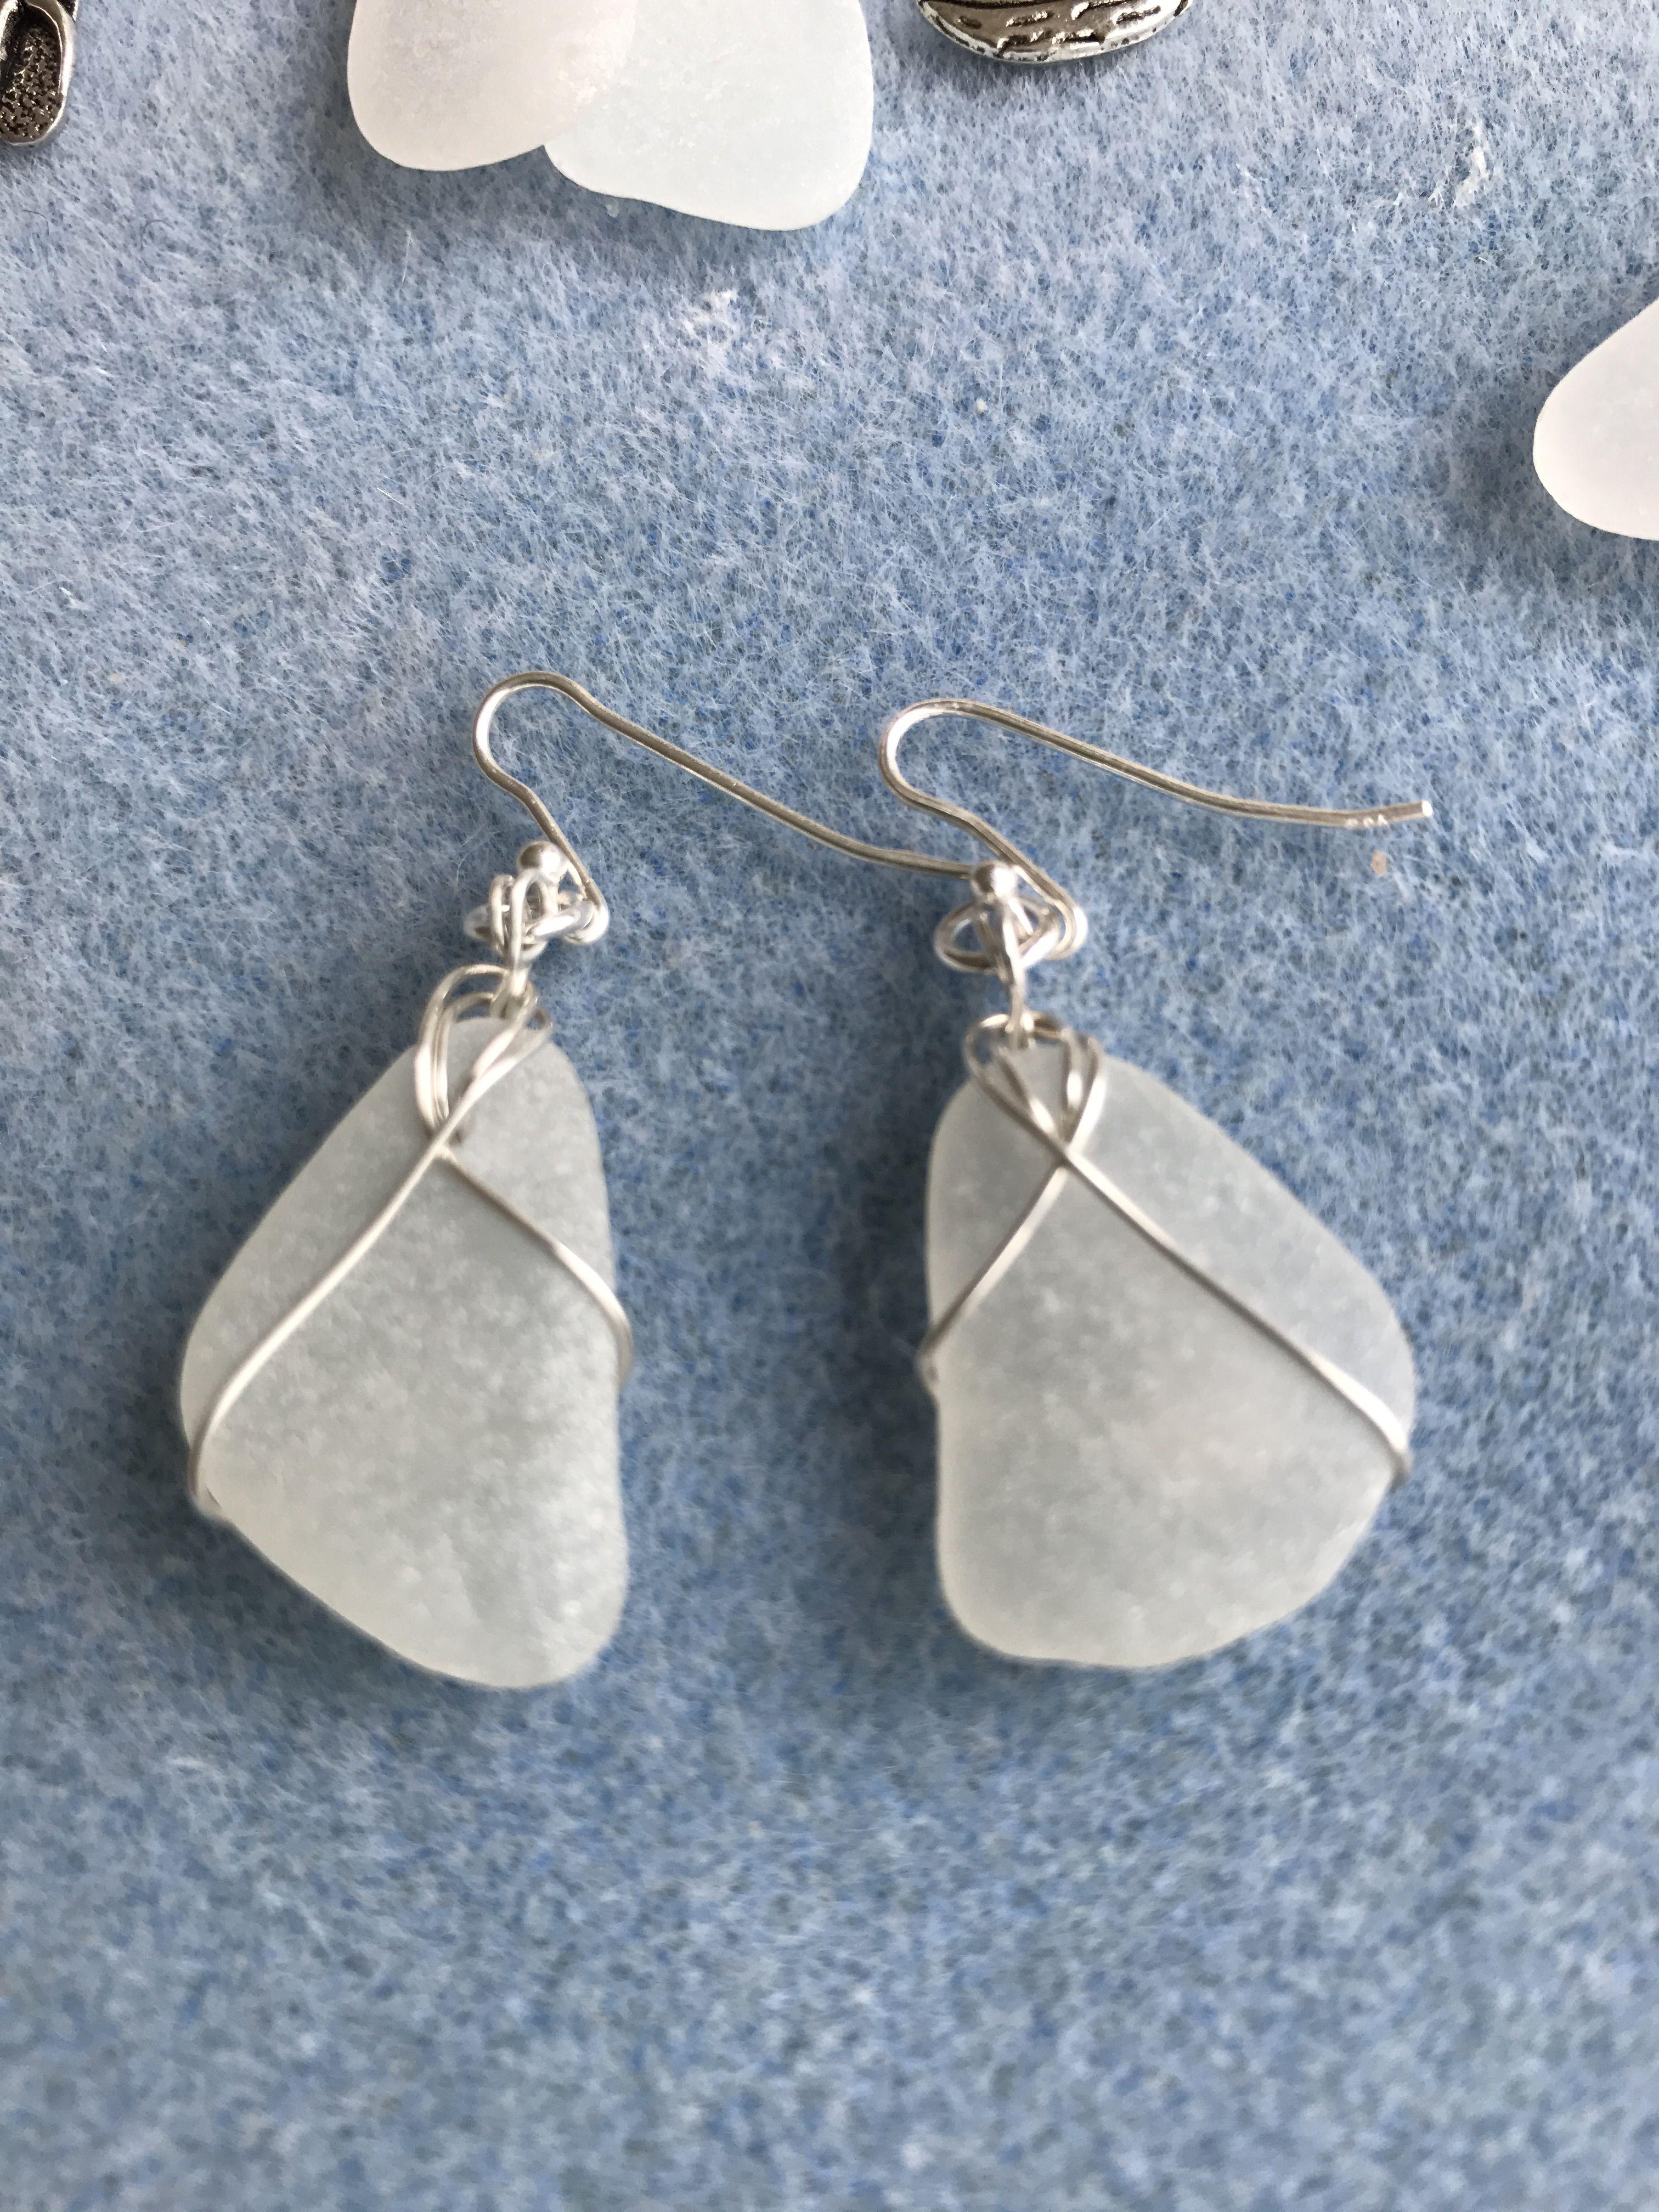 Sterling silver, wire wrapped earrings! | Beach glass beauty ...